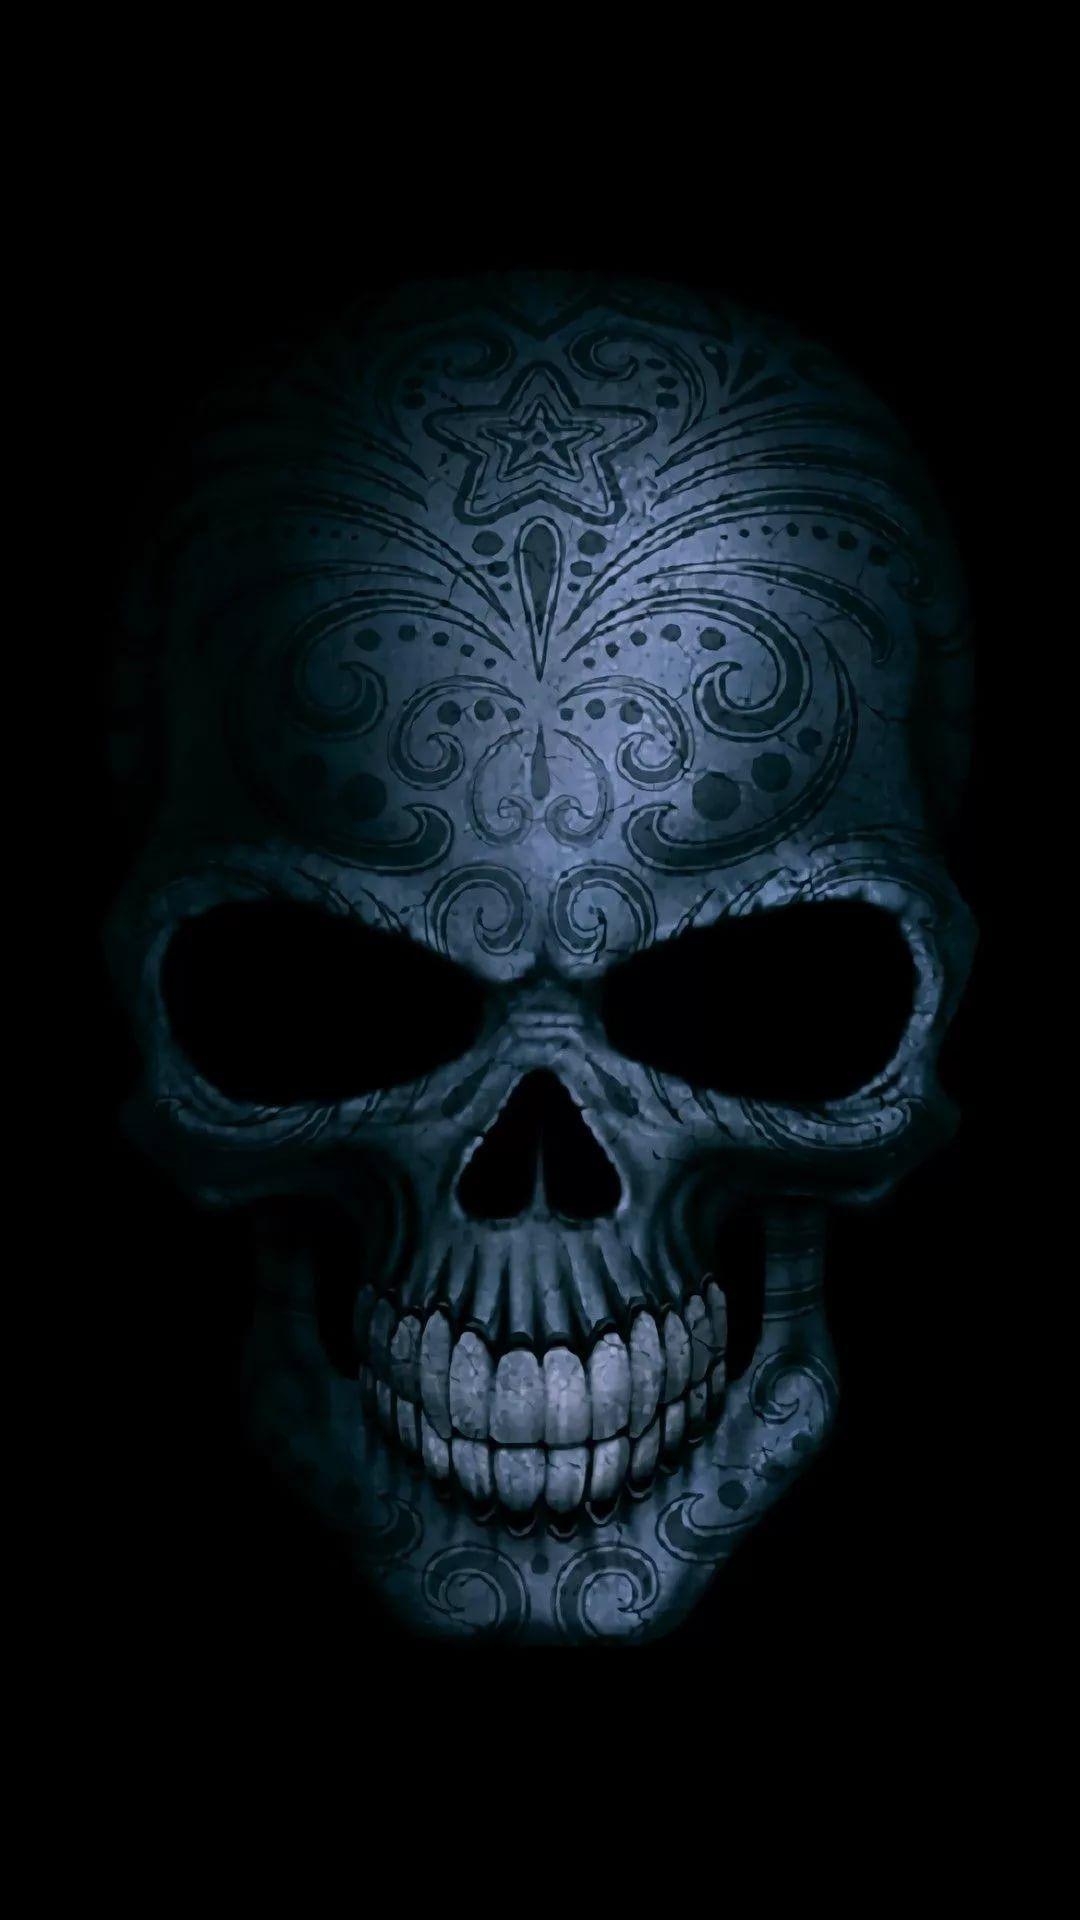 Cool Skull screen wallpaper